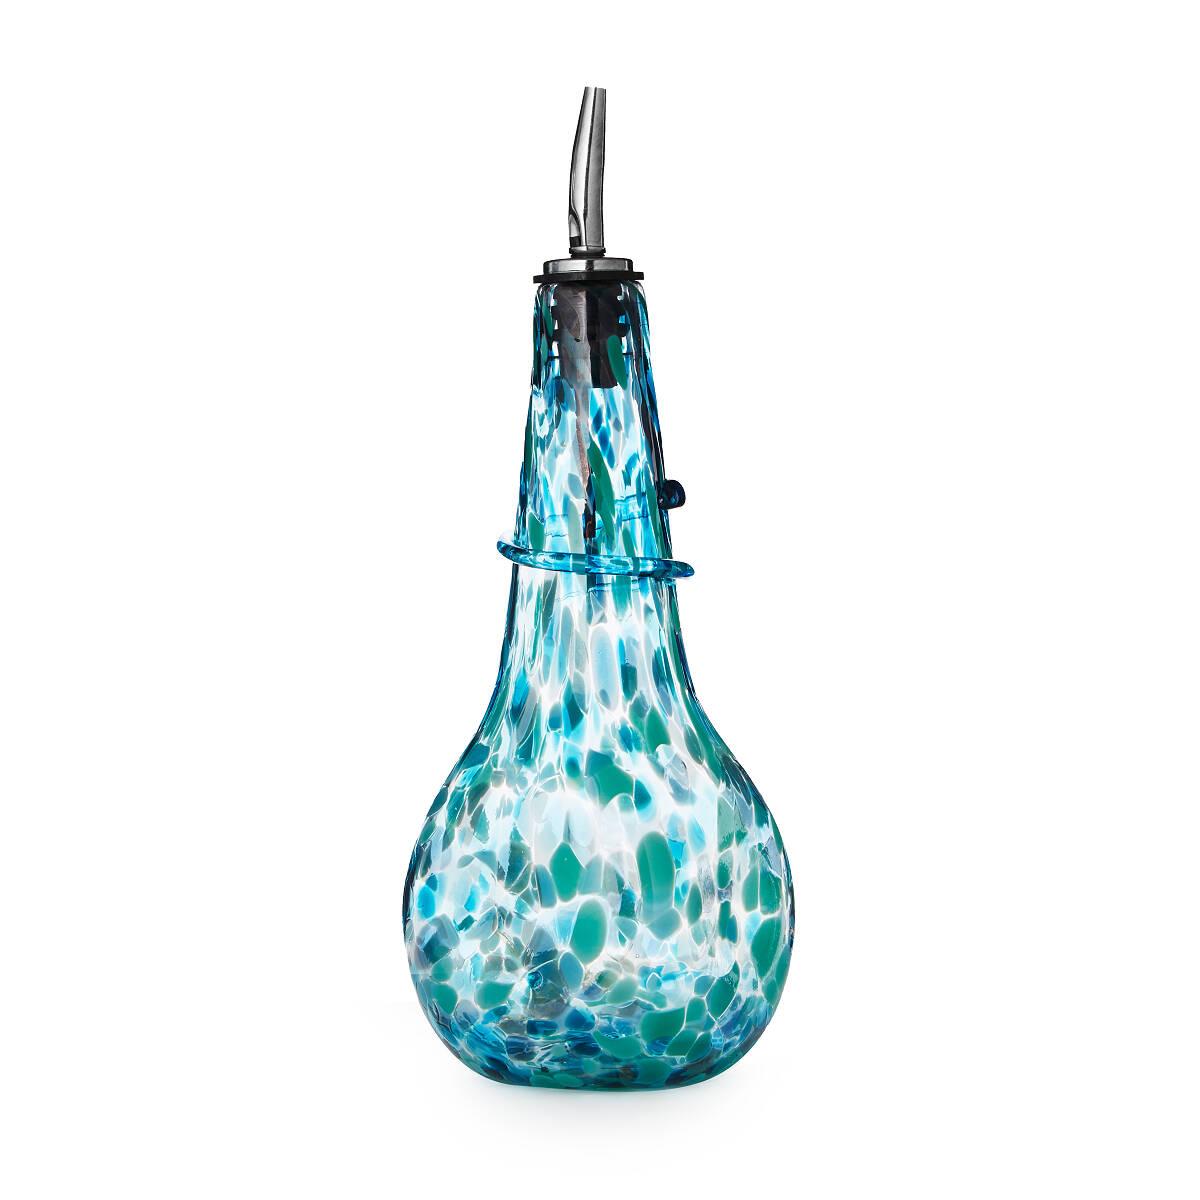 Speckled Glass Olive Oil Dispenser | Handmade Kitchen Tools; Glass ...